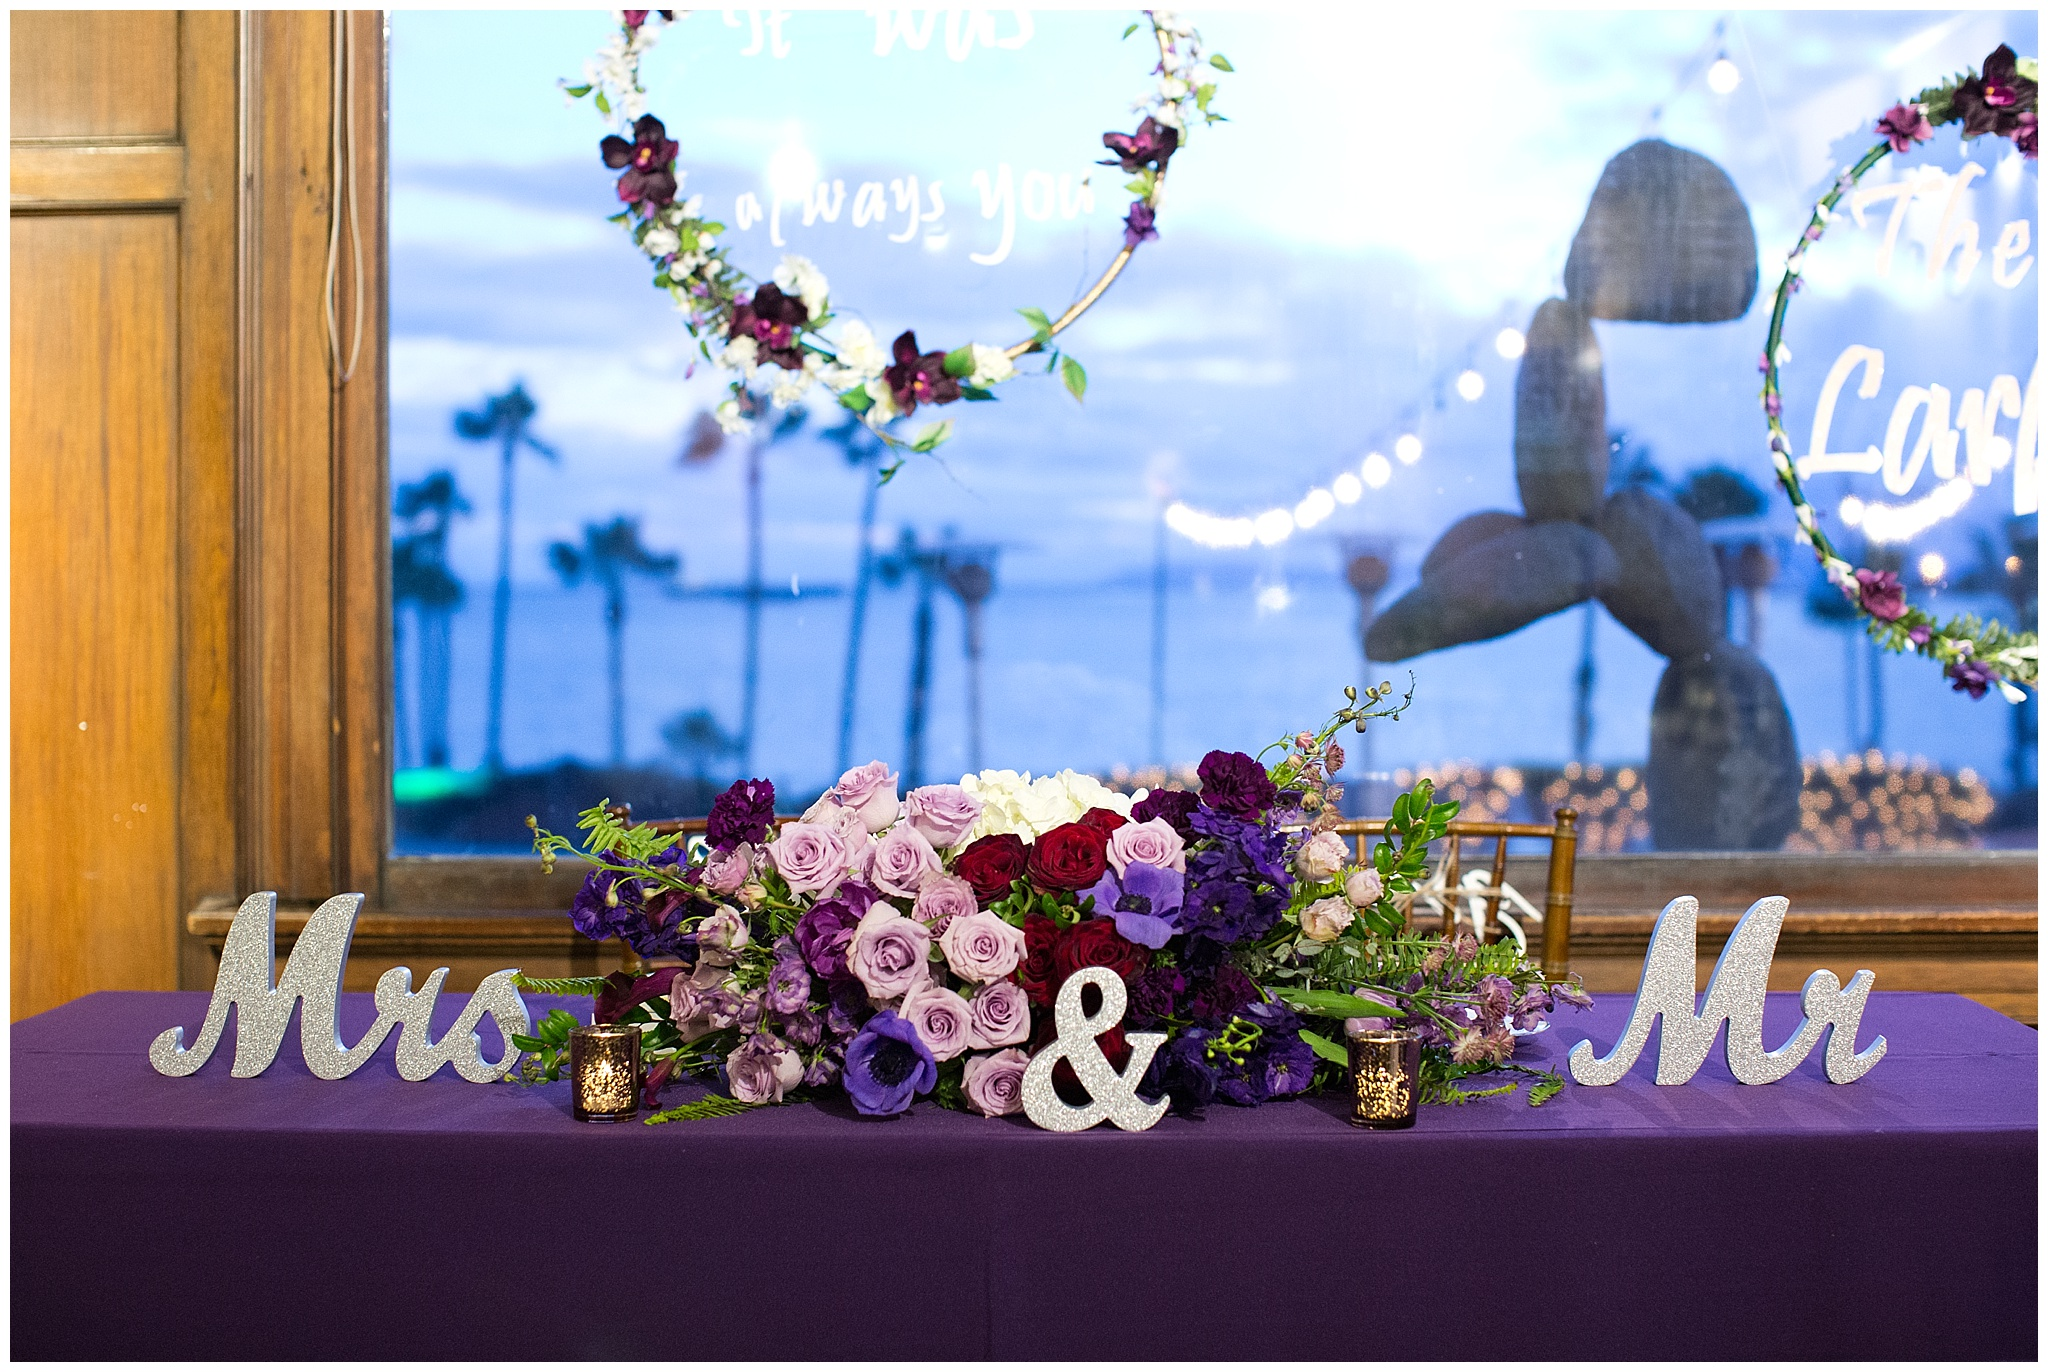 Carol_and_Grant_Wedding_3-3-18-8360.jpg